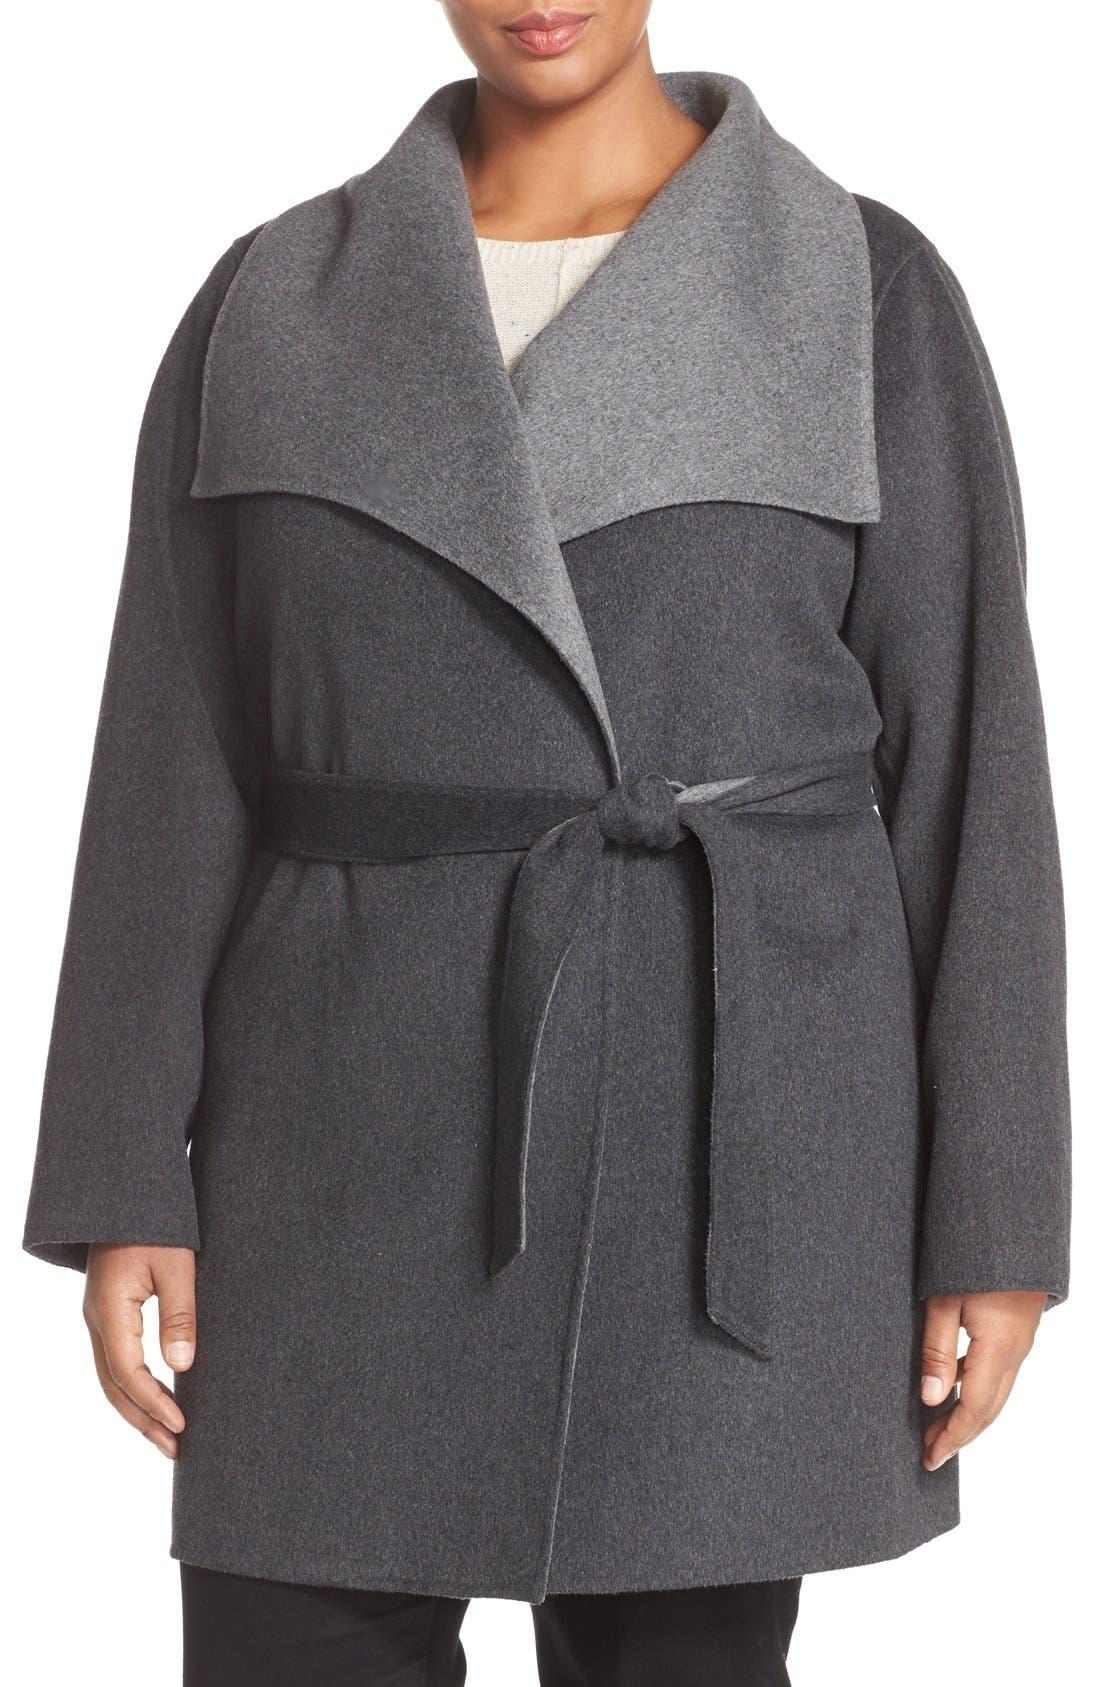 Tahari 'Ella' Belted Two-Tone Wool Blend Wrap Coat (Plus Size)